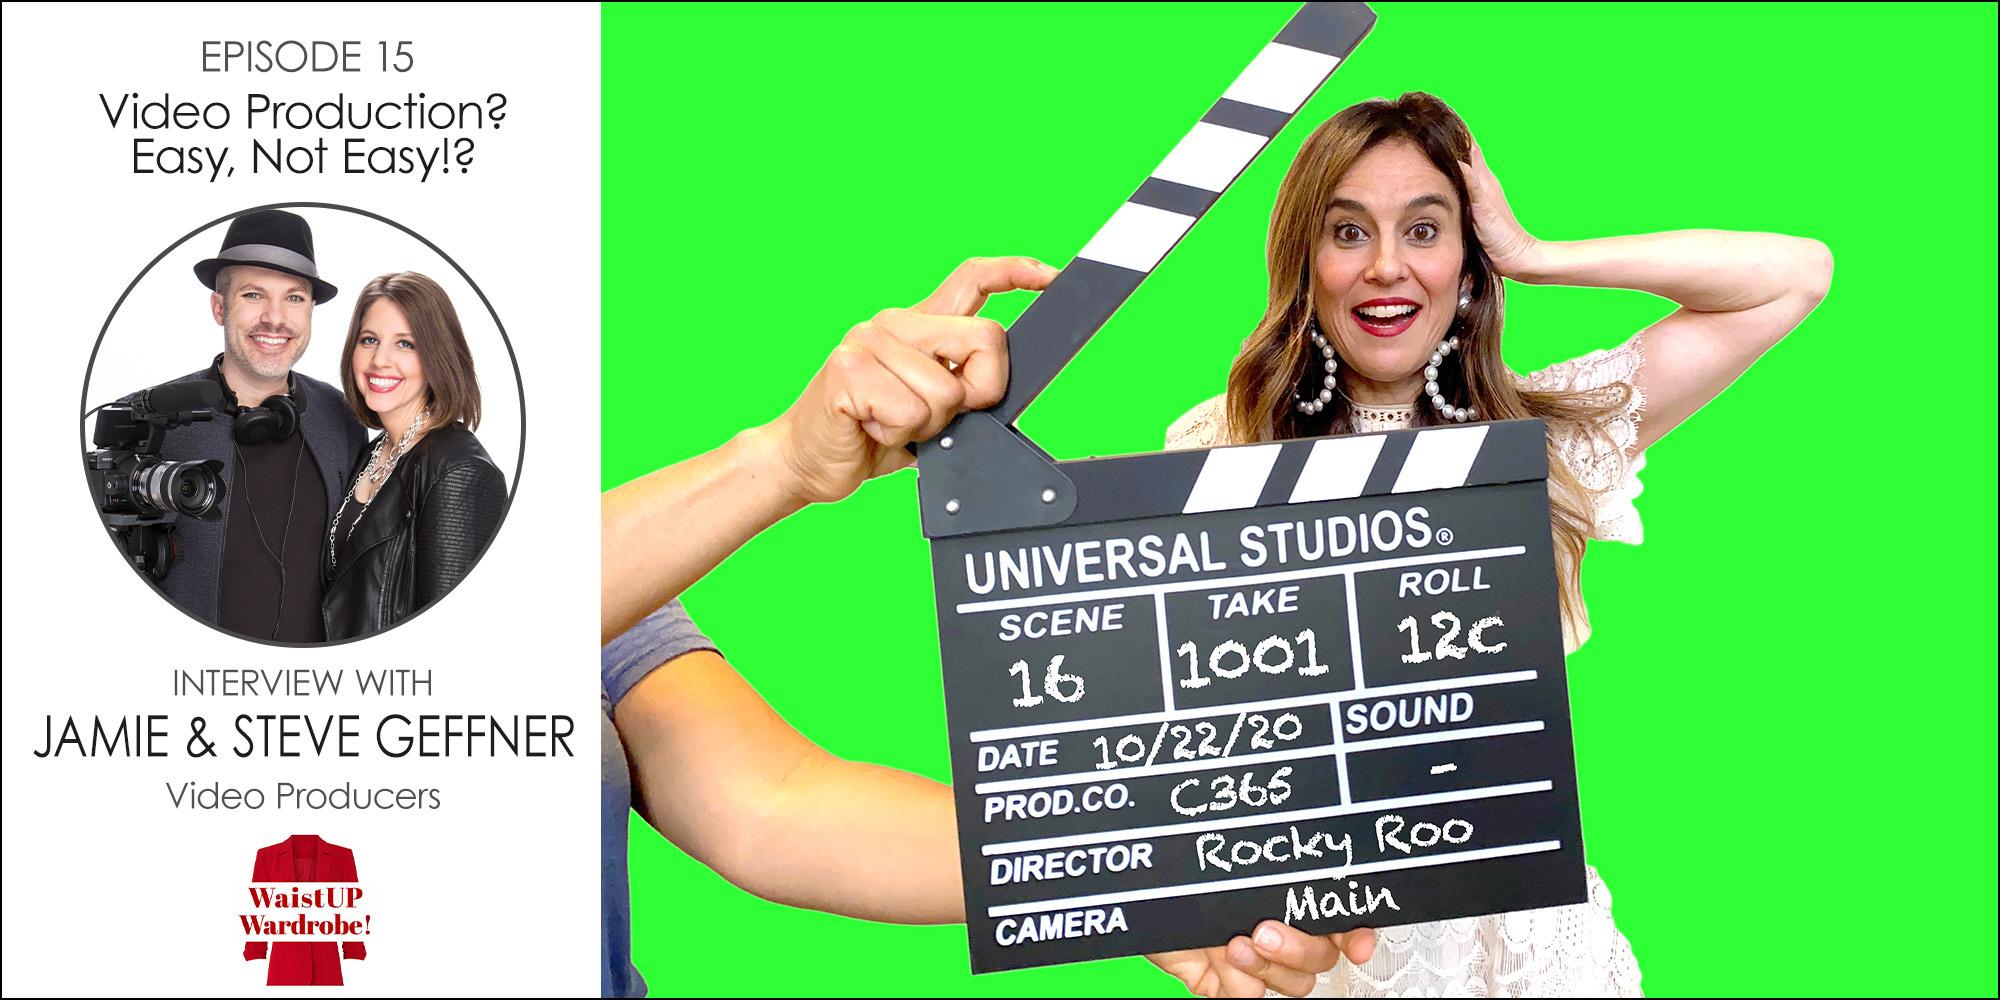 episdoe 15 Video Production. Easy Not Easy